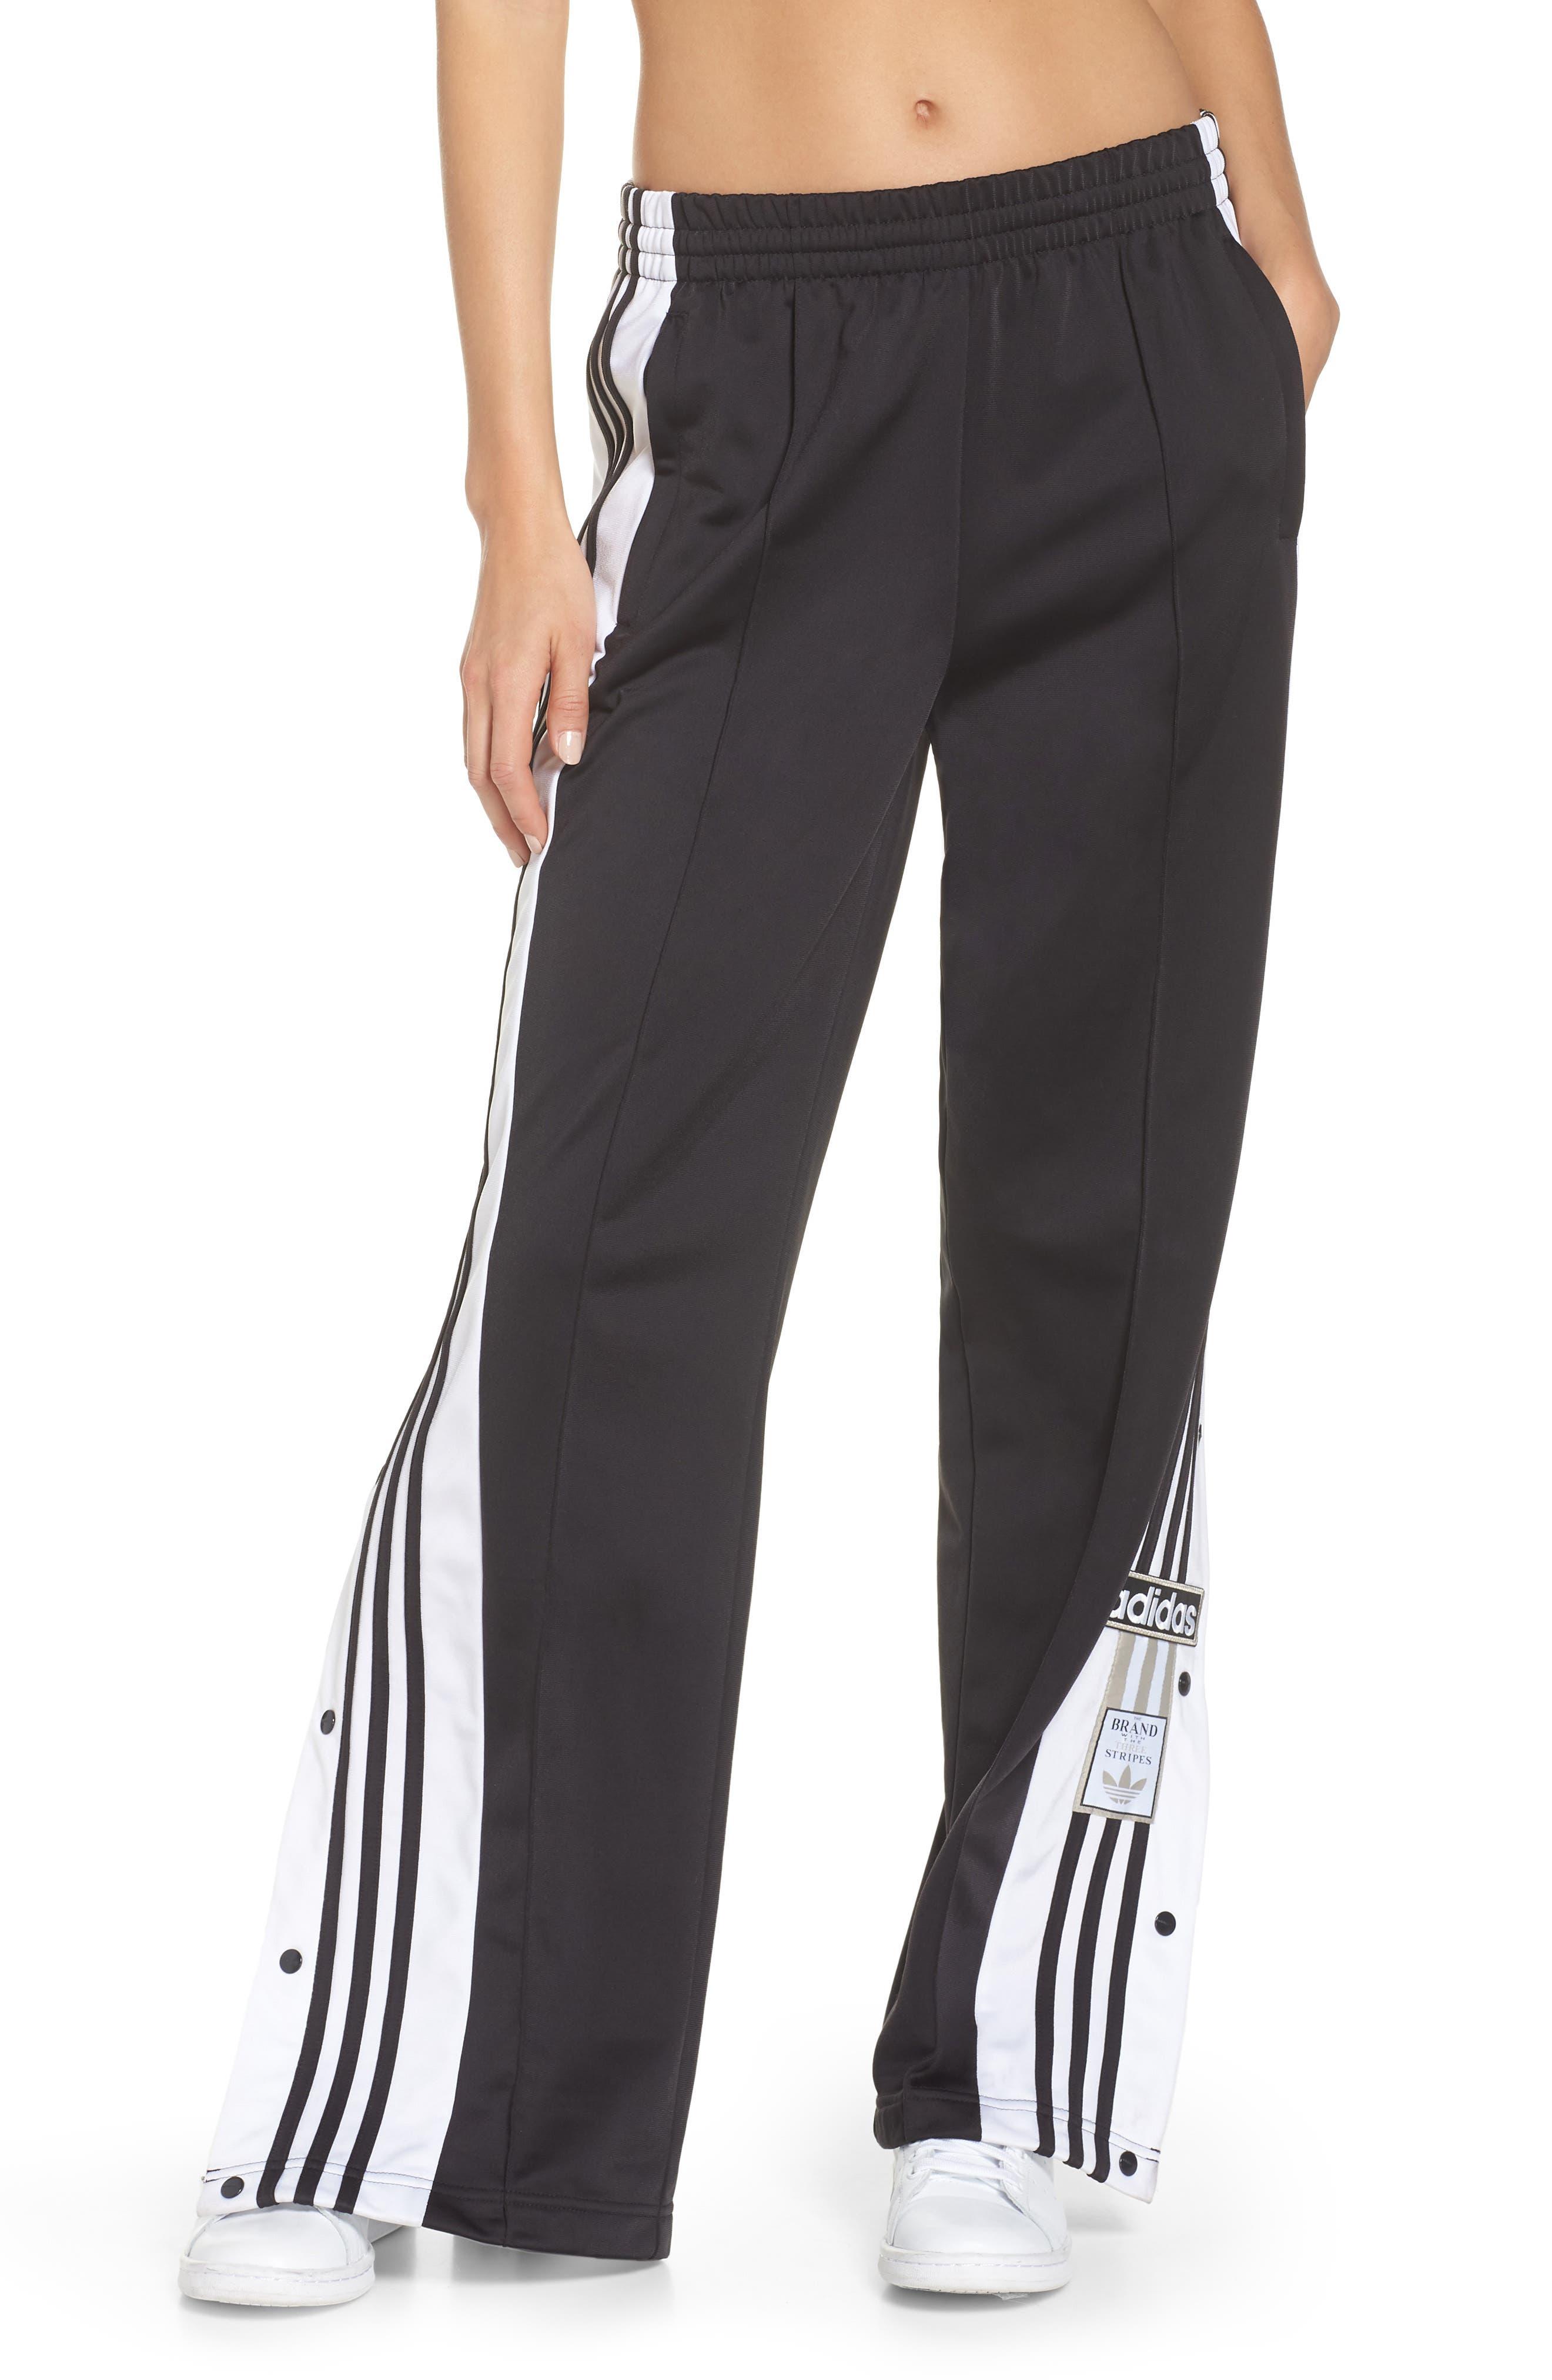 Adibreak Tearaway Track Pants,                         Main,                         color, BLACK/ CARBON